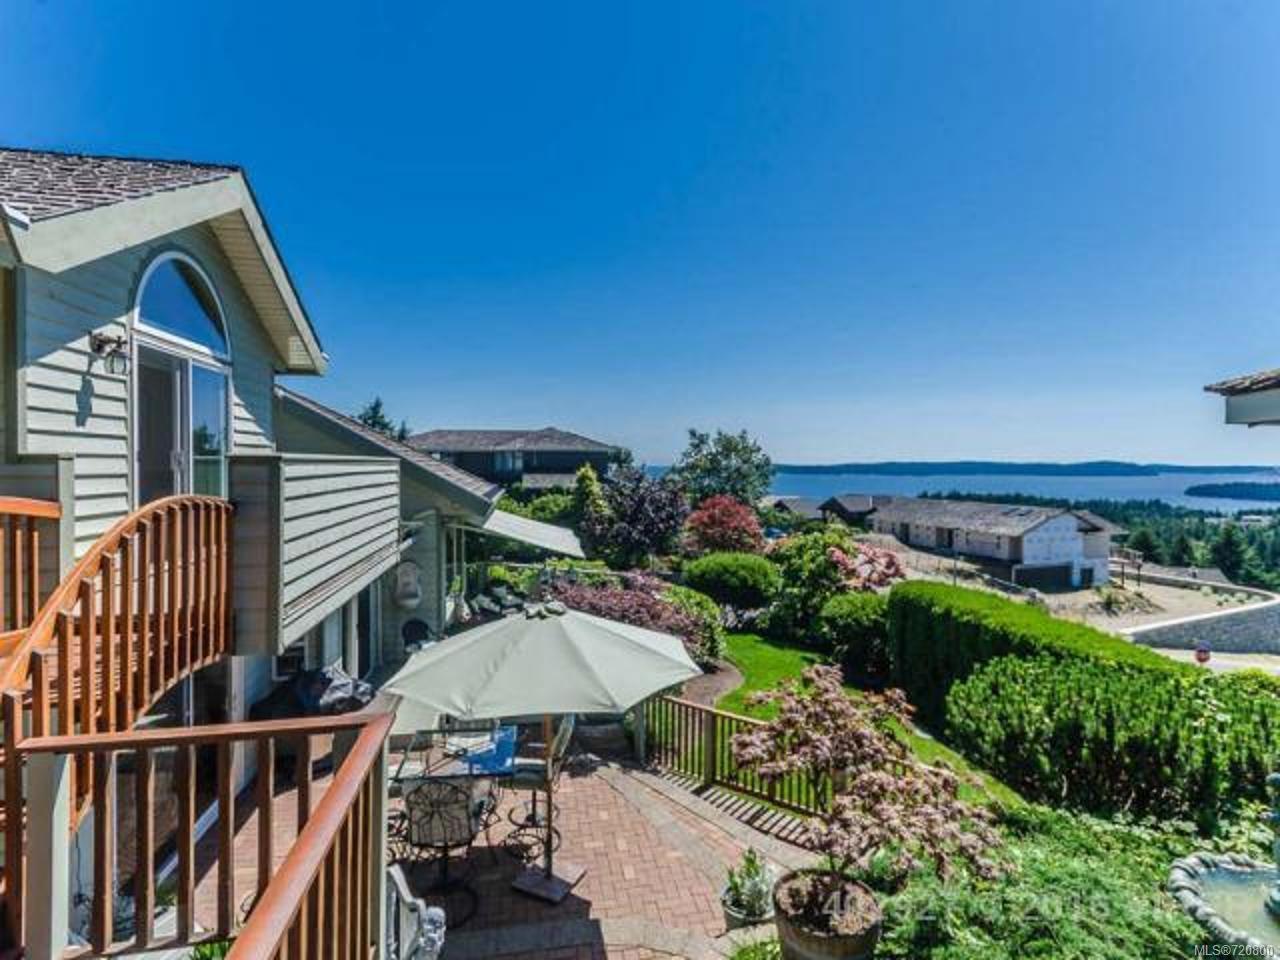 Main Photo: 3688 Glen Oaks Dr in NANAIMO: Na Hammond Bay House for sale (Nanaimo)  : MLS®# 720800